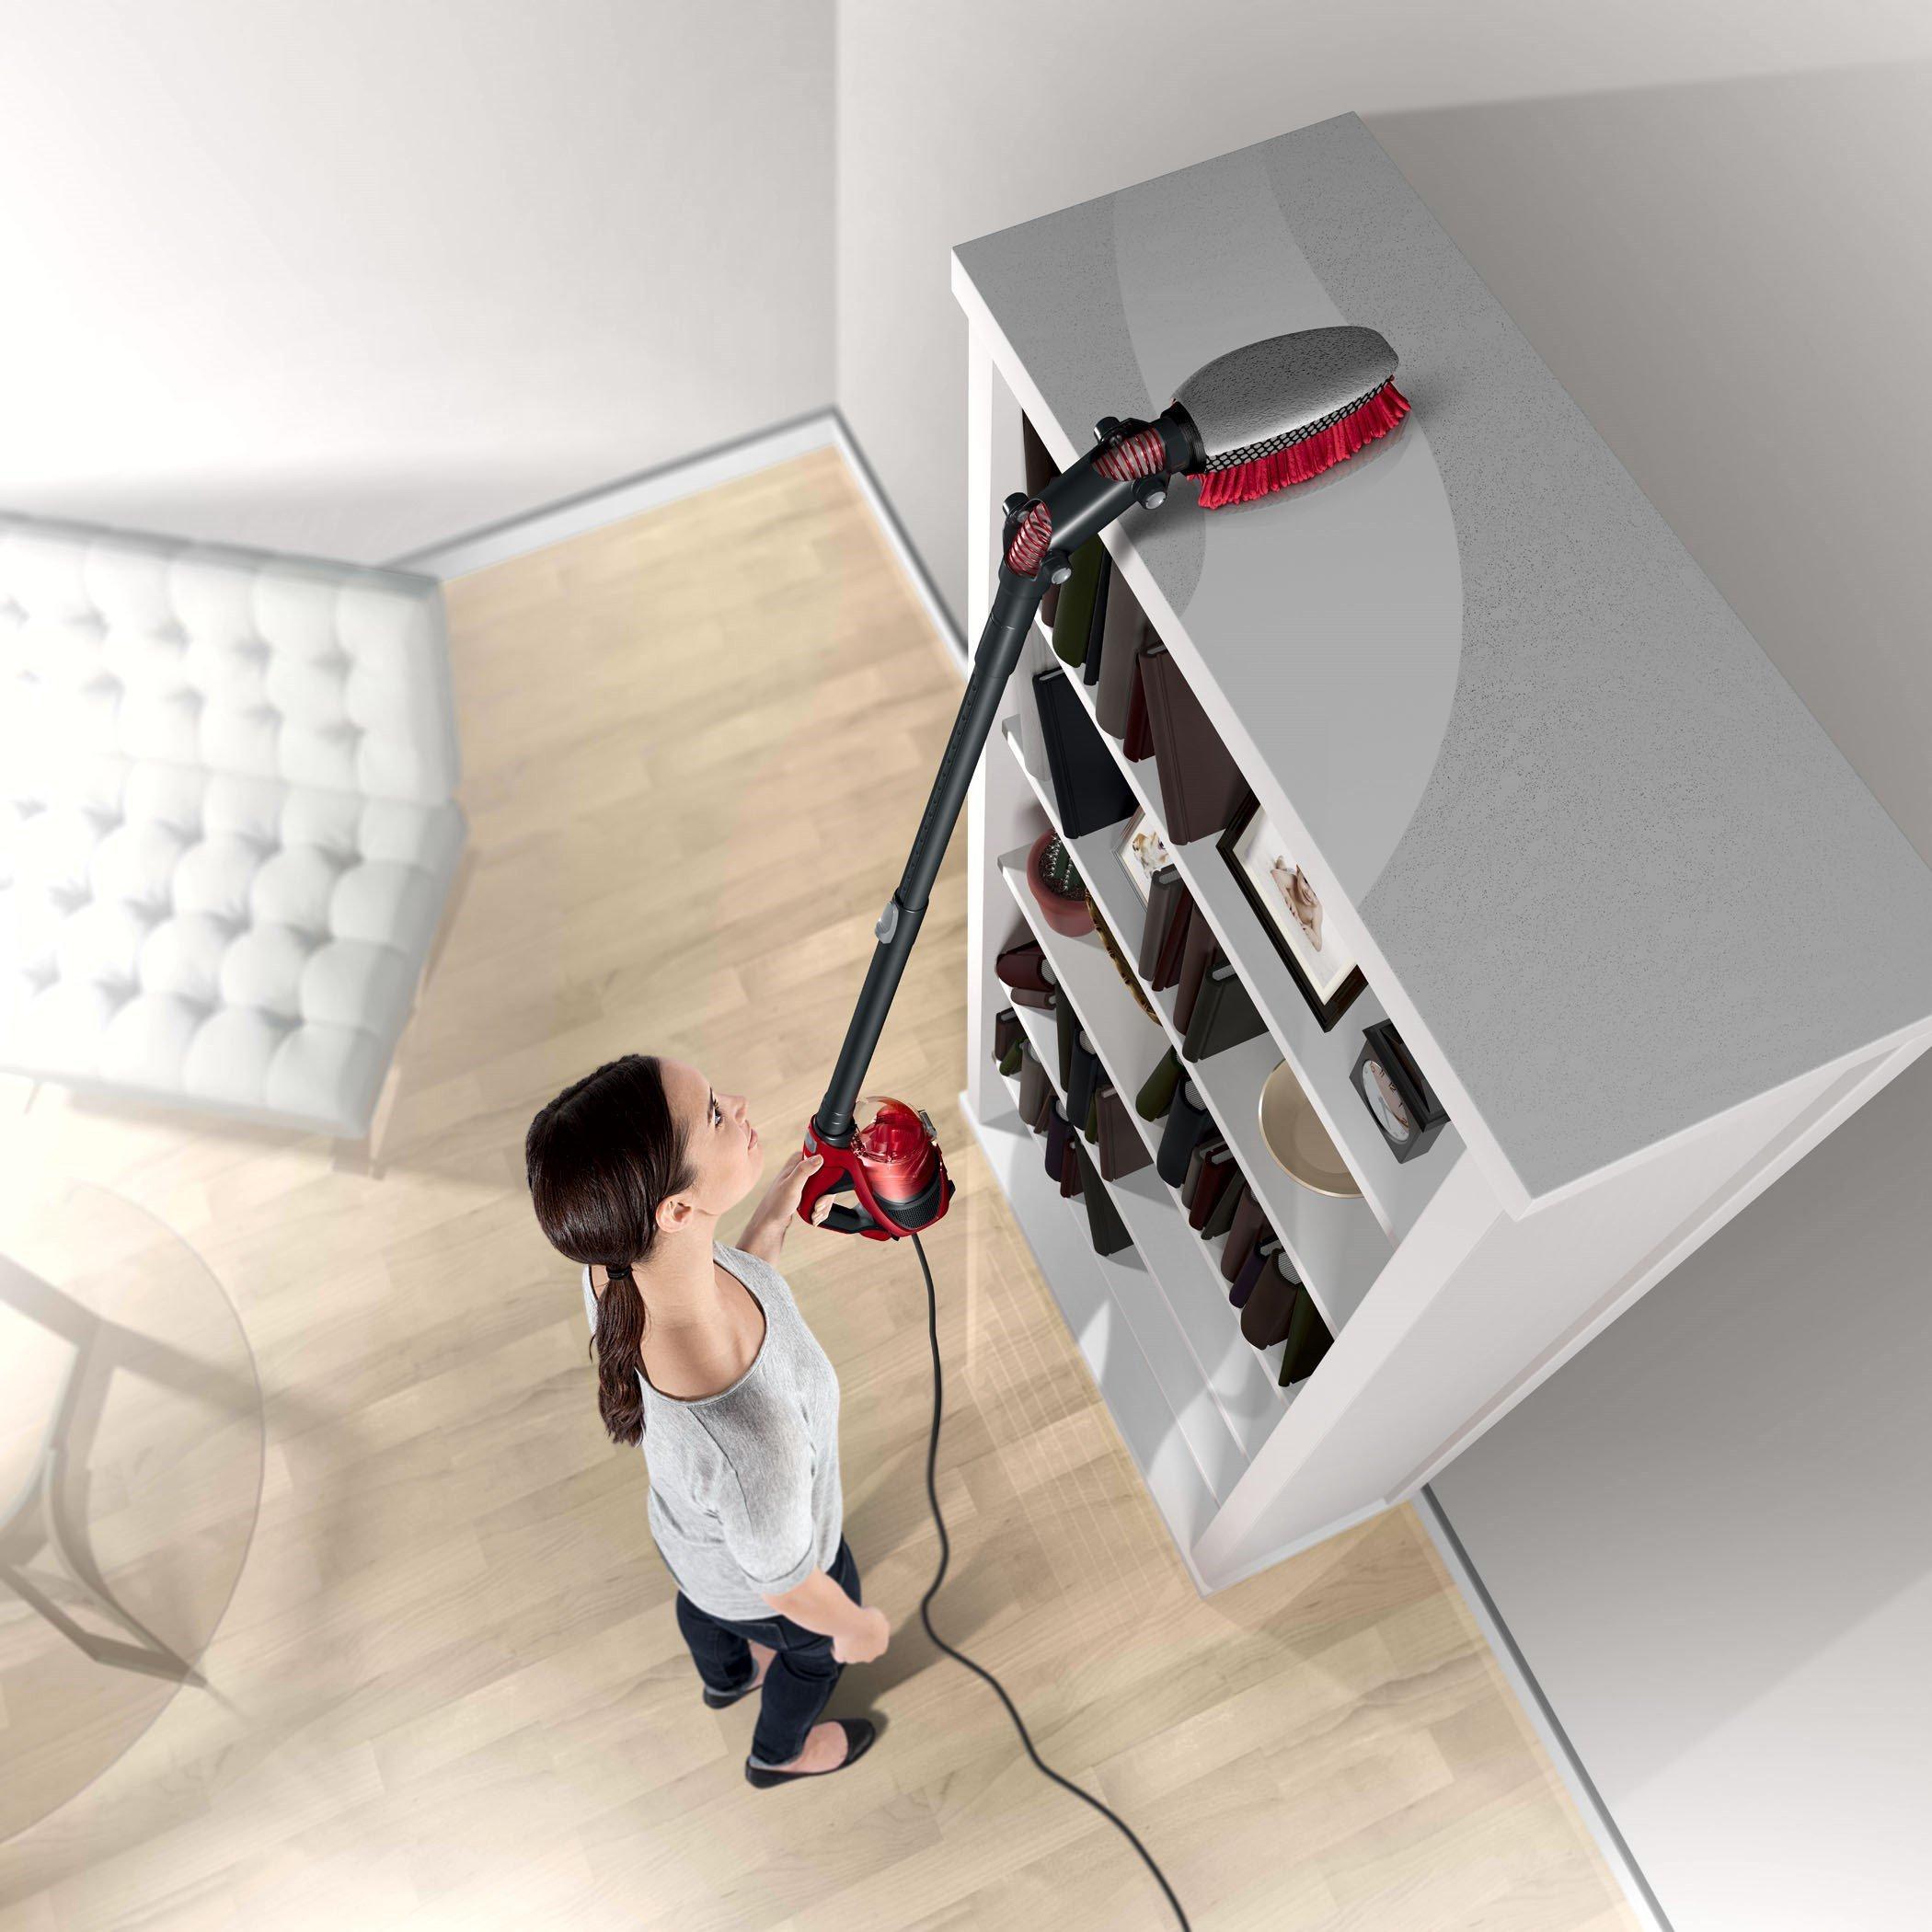 360 Reach Power Bagless Hand Vacuum Dirtdevil